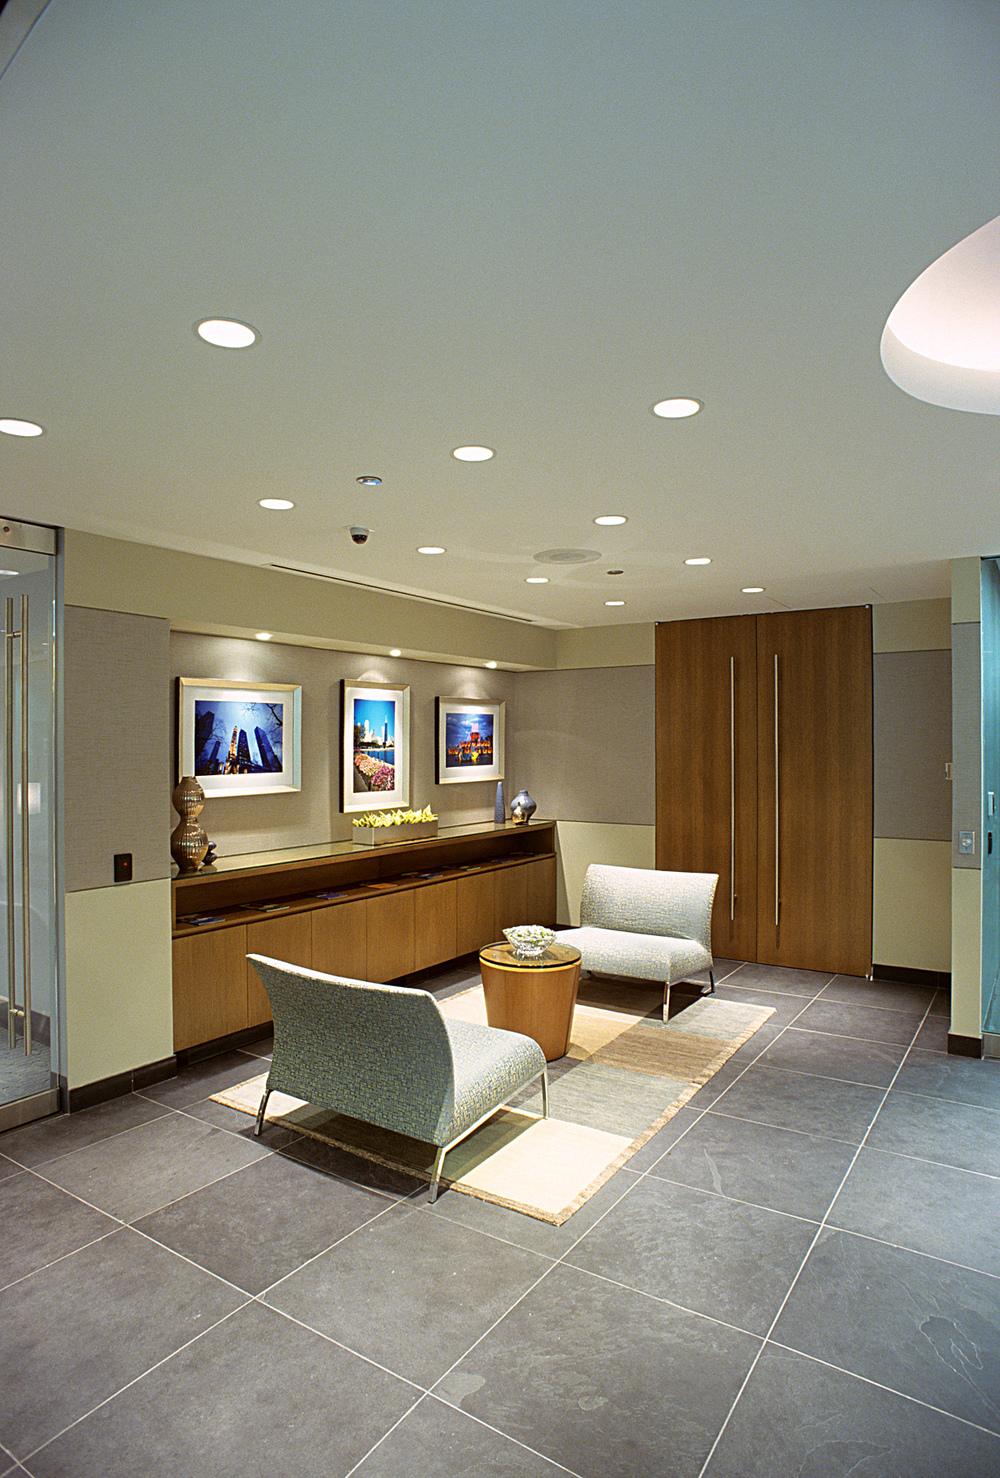 Tobin Parnes Design. Workplace Design. Office Design. Office Design